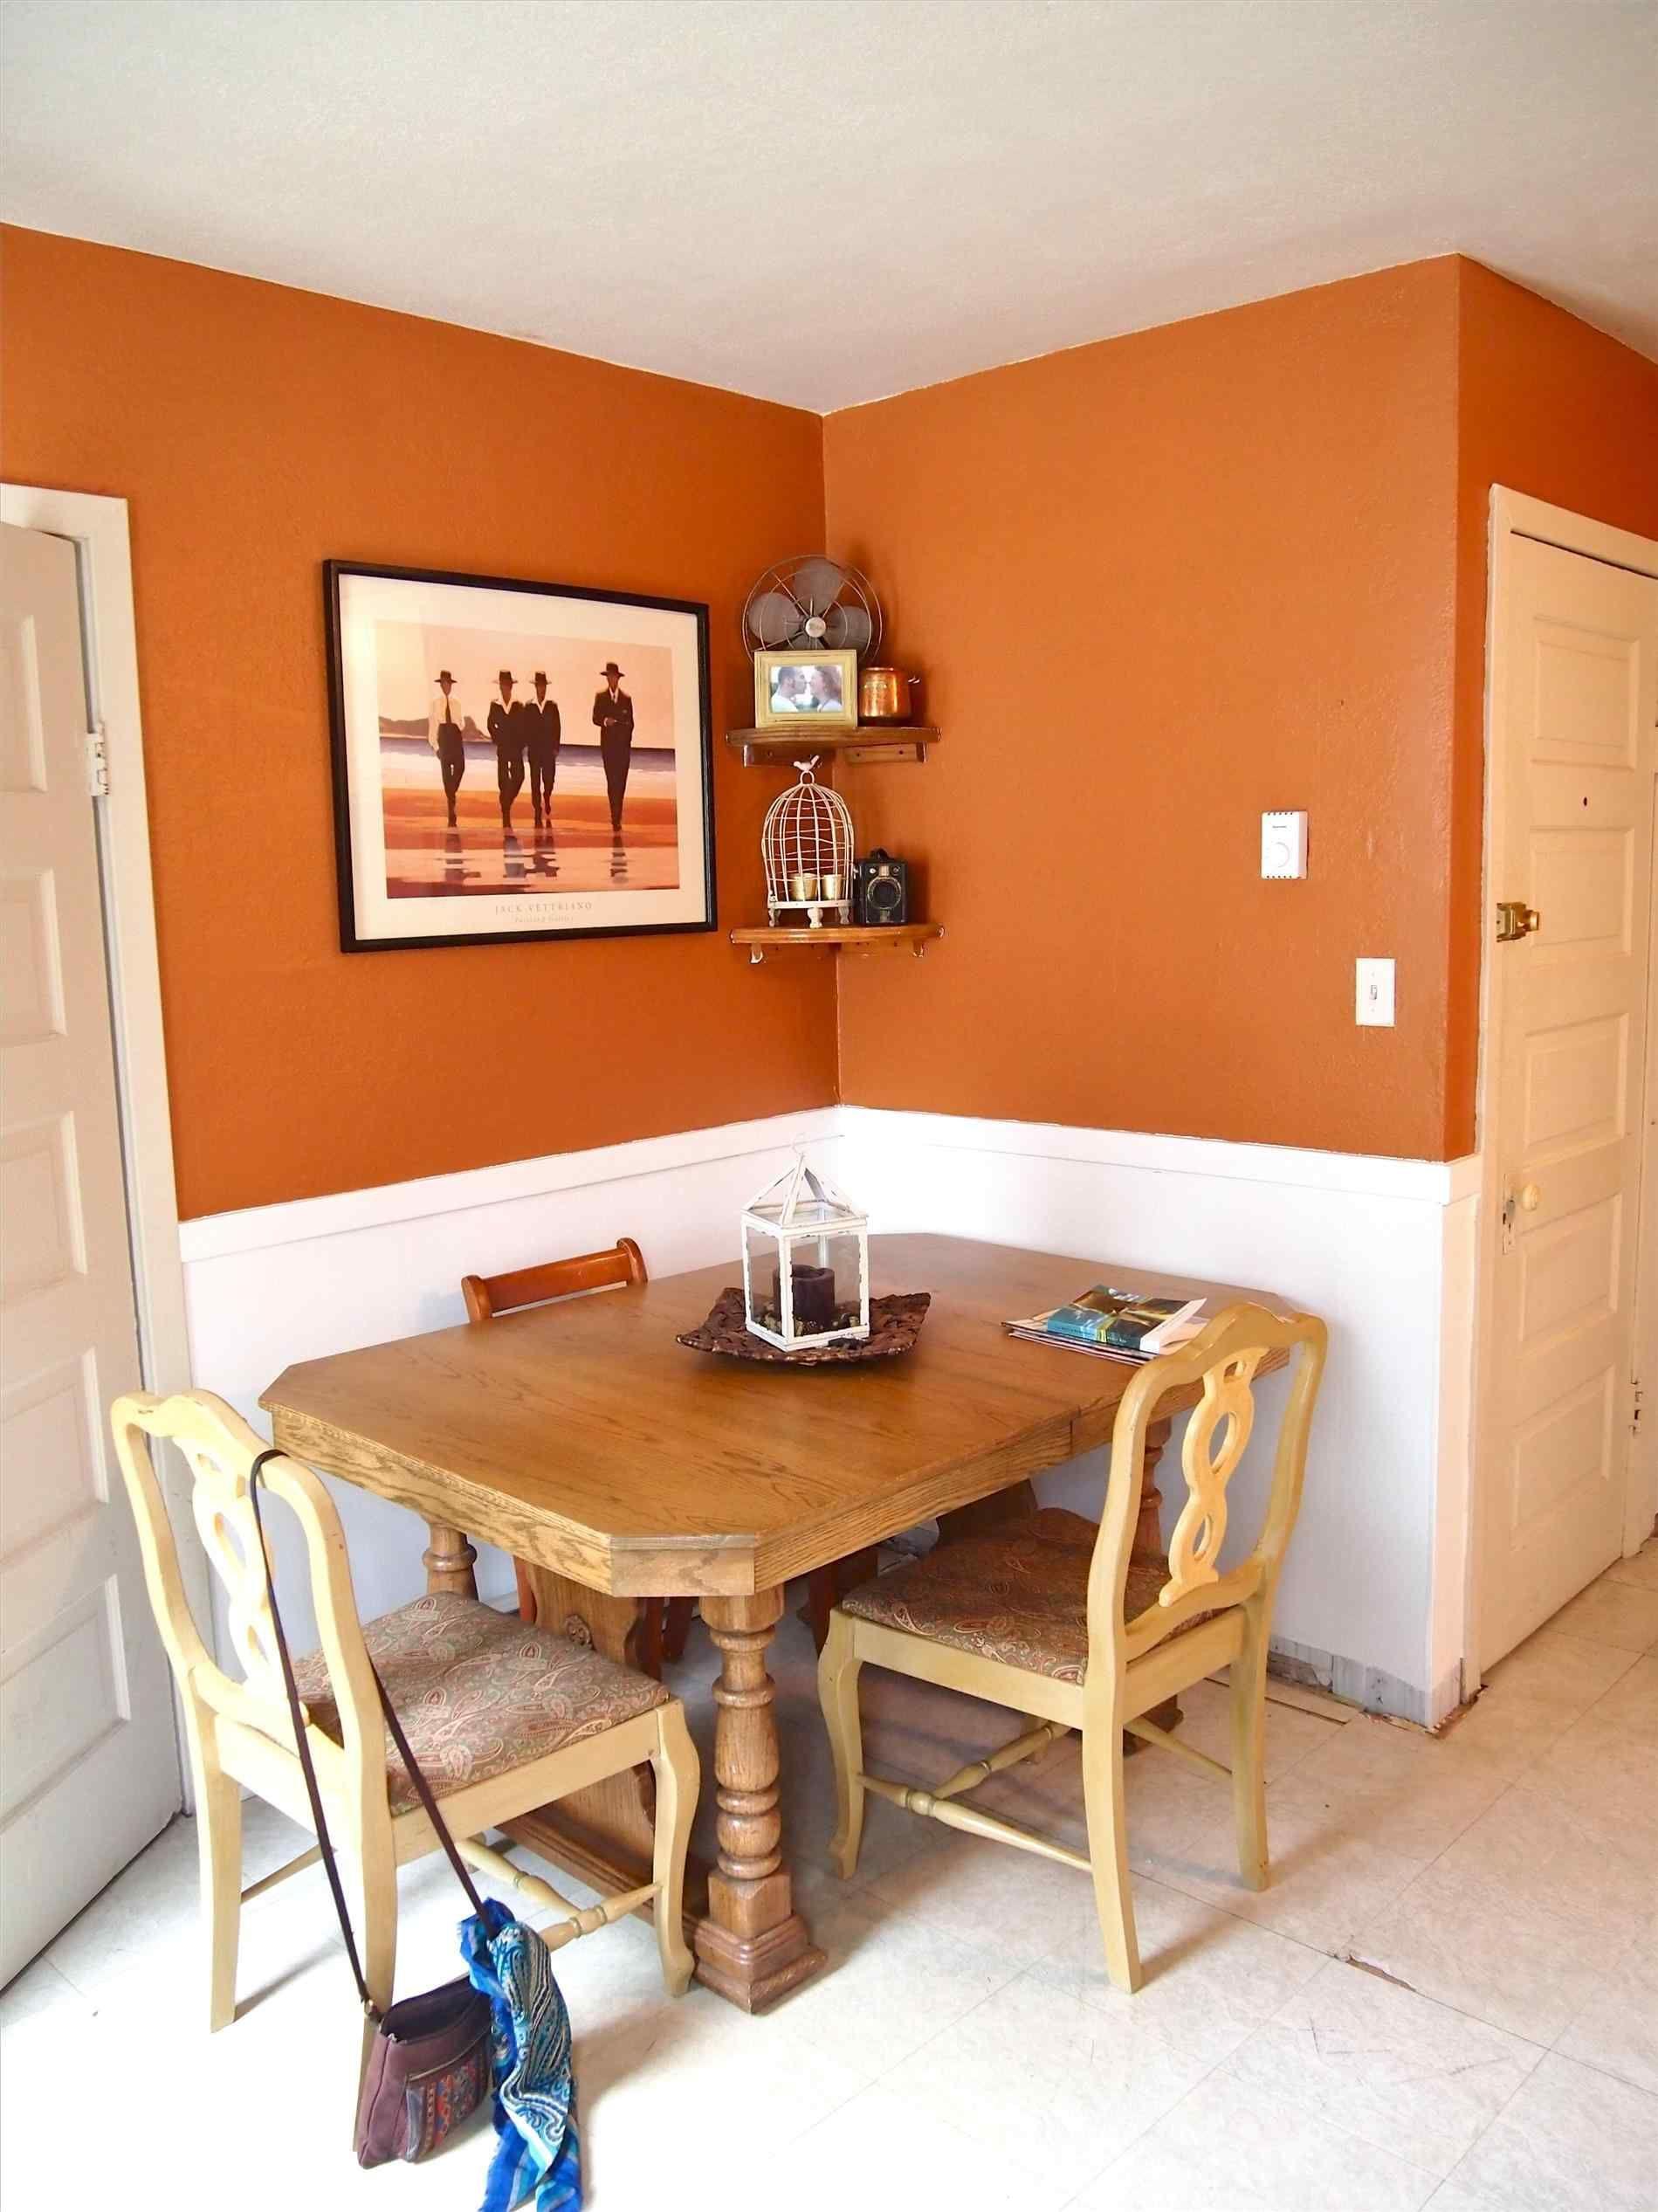 10 Fresh And Wonderful Orange Kitchen Decorations For Inspiration